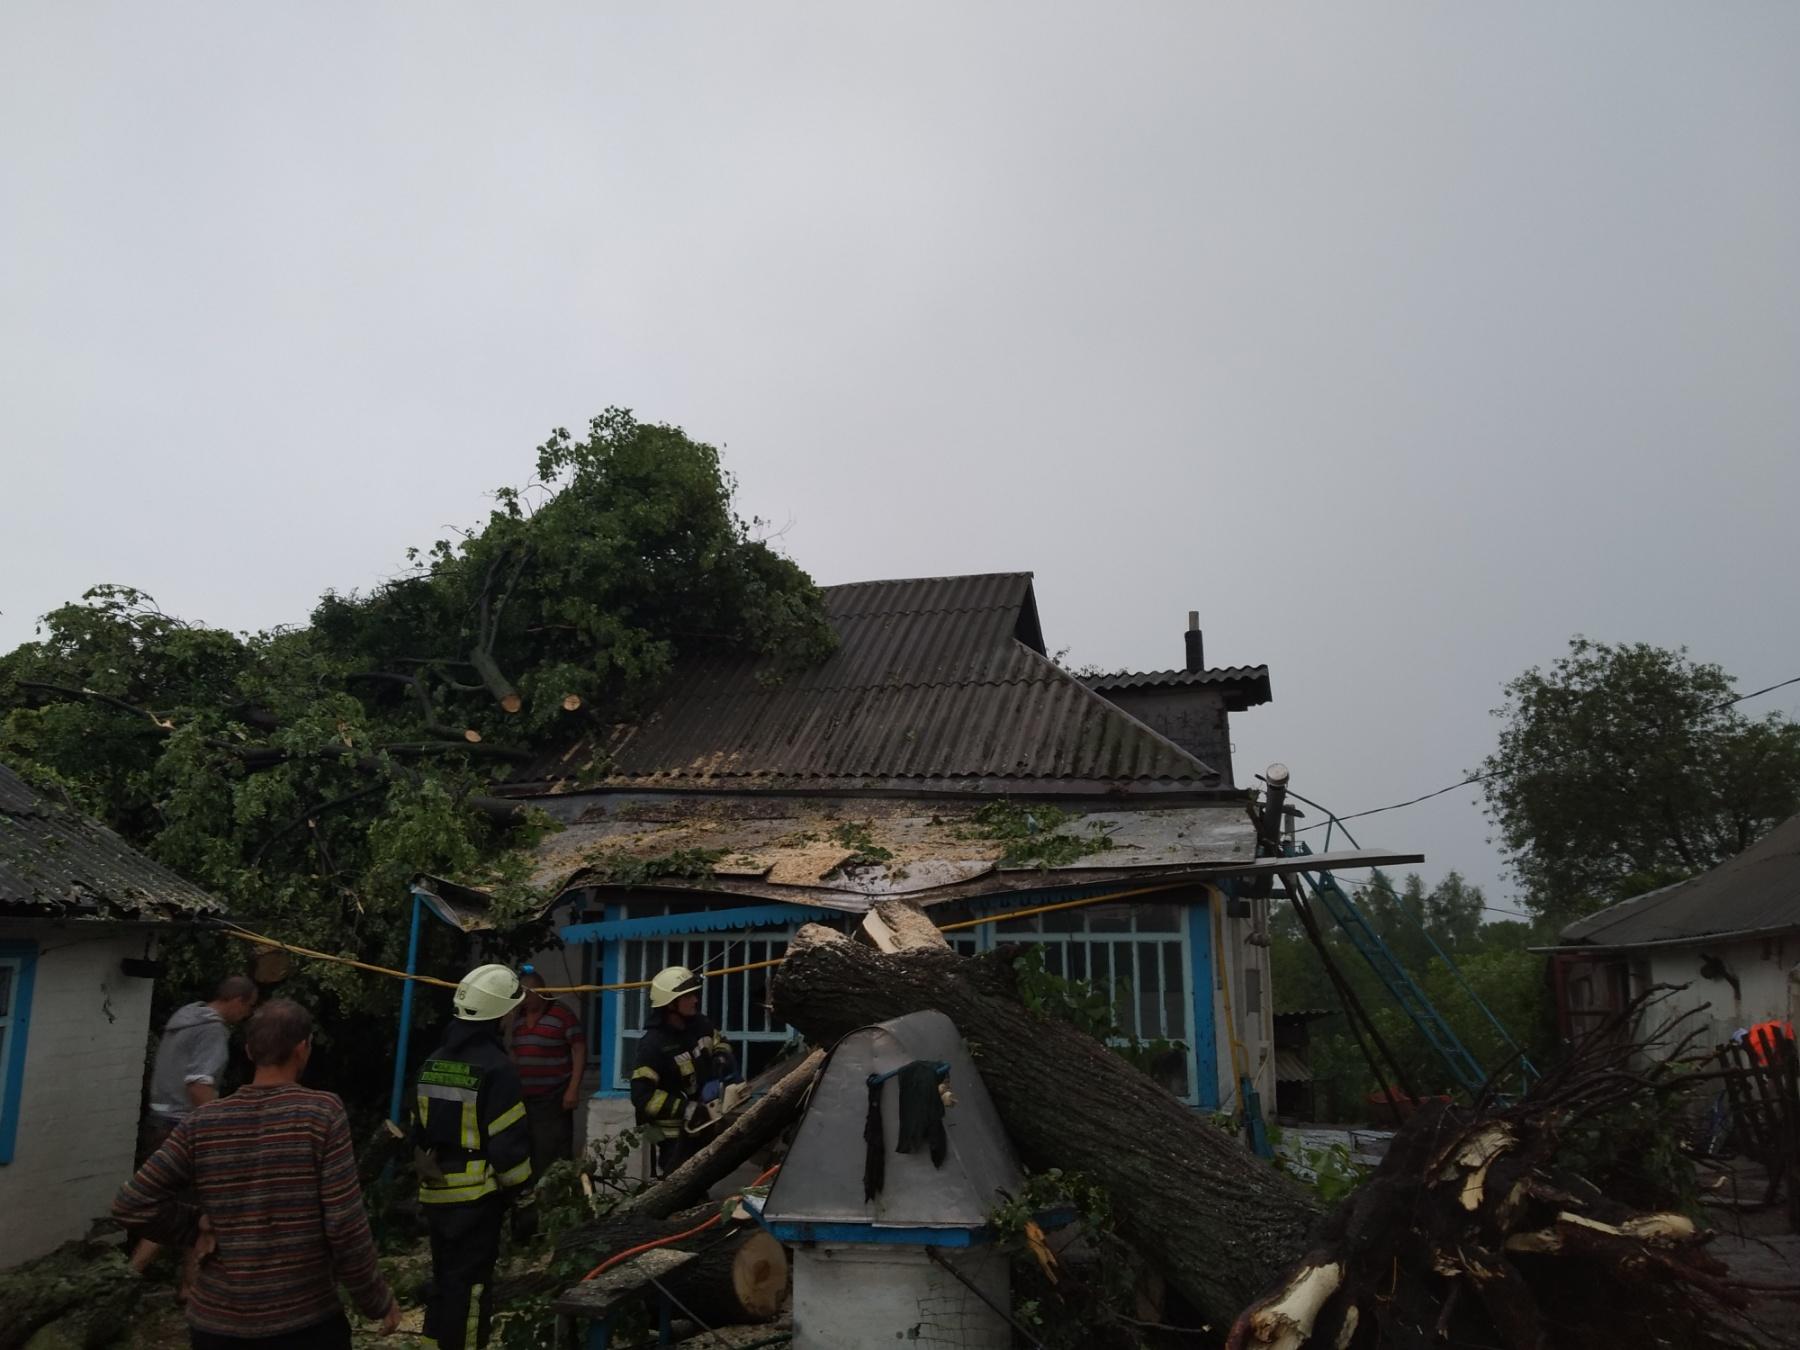 На Обухівщині велике дерево впало на приватний будинок -  - media share 0 02 0a 30d5e9d3afbc35dcaf98064ce064ef2b83eb2029a78fb65433bc9decd47f2cb6 67396a9a 6309 48c4 88d1 5ce61c5dfc27